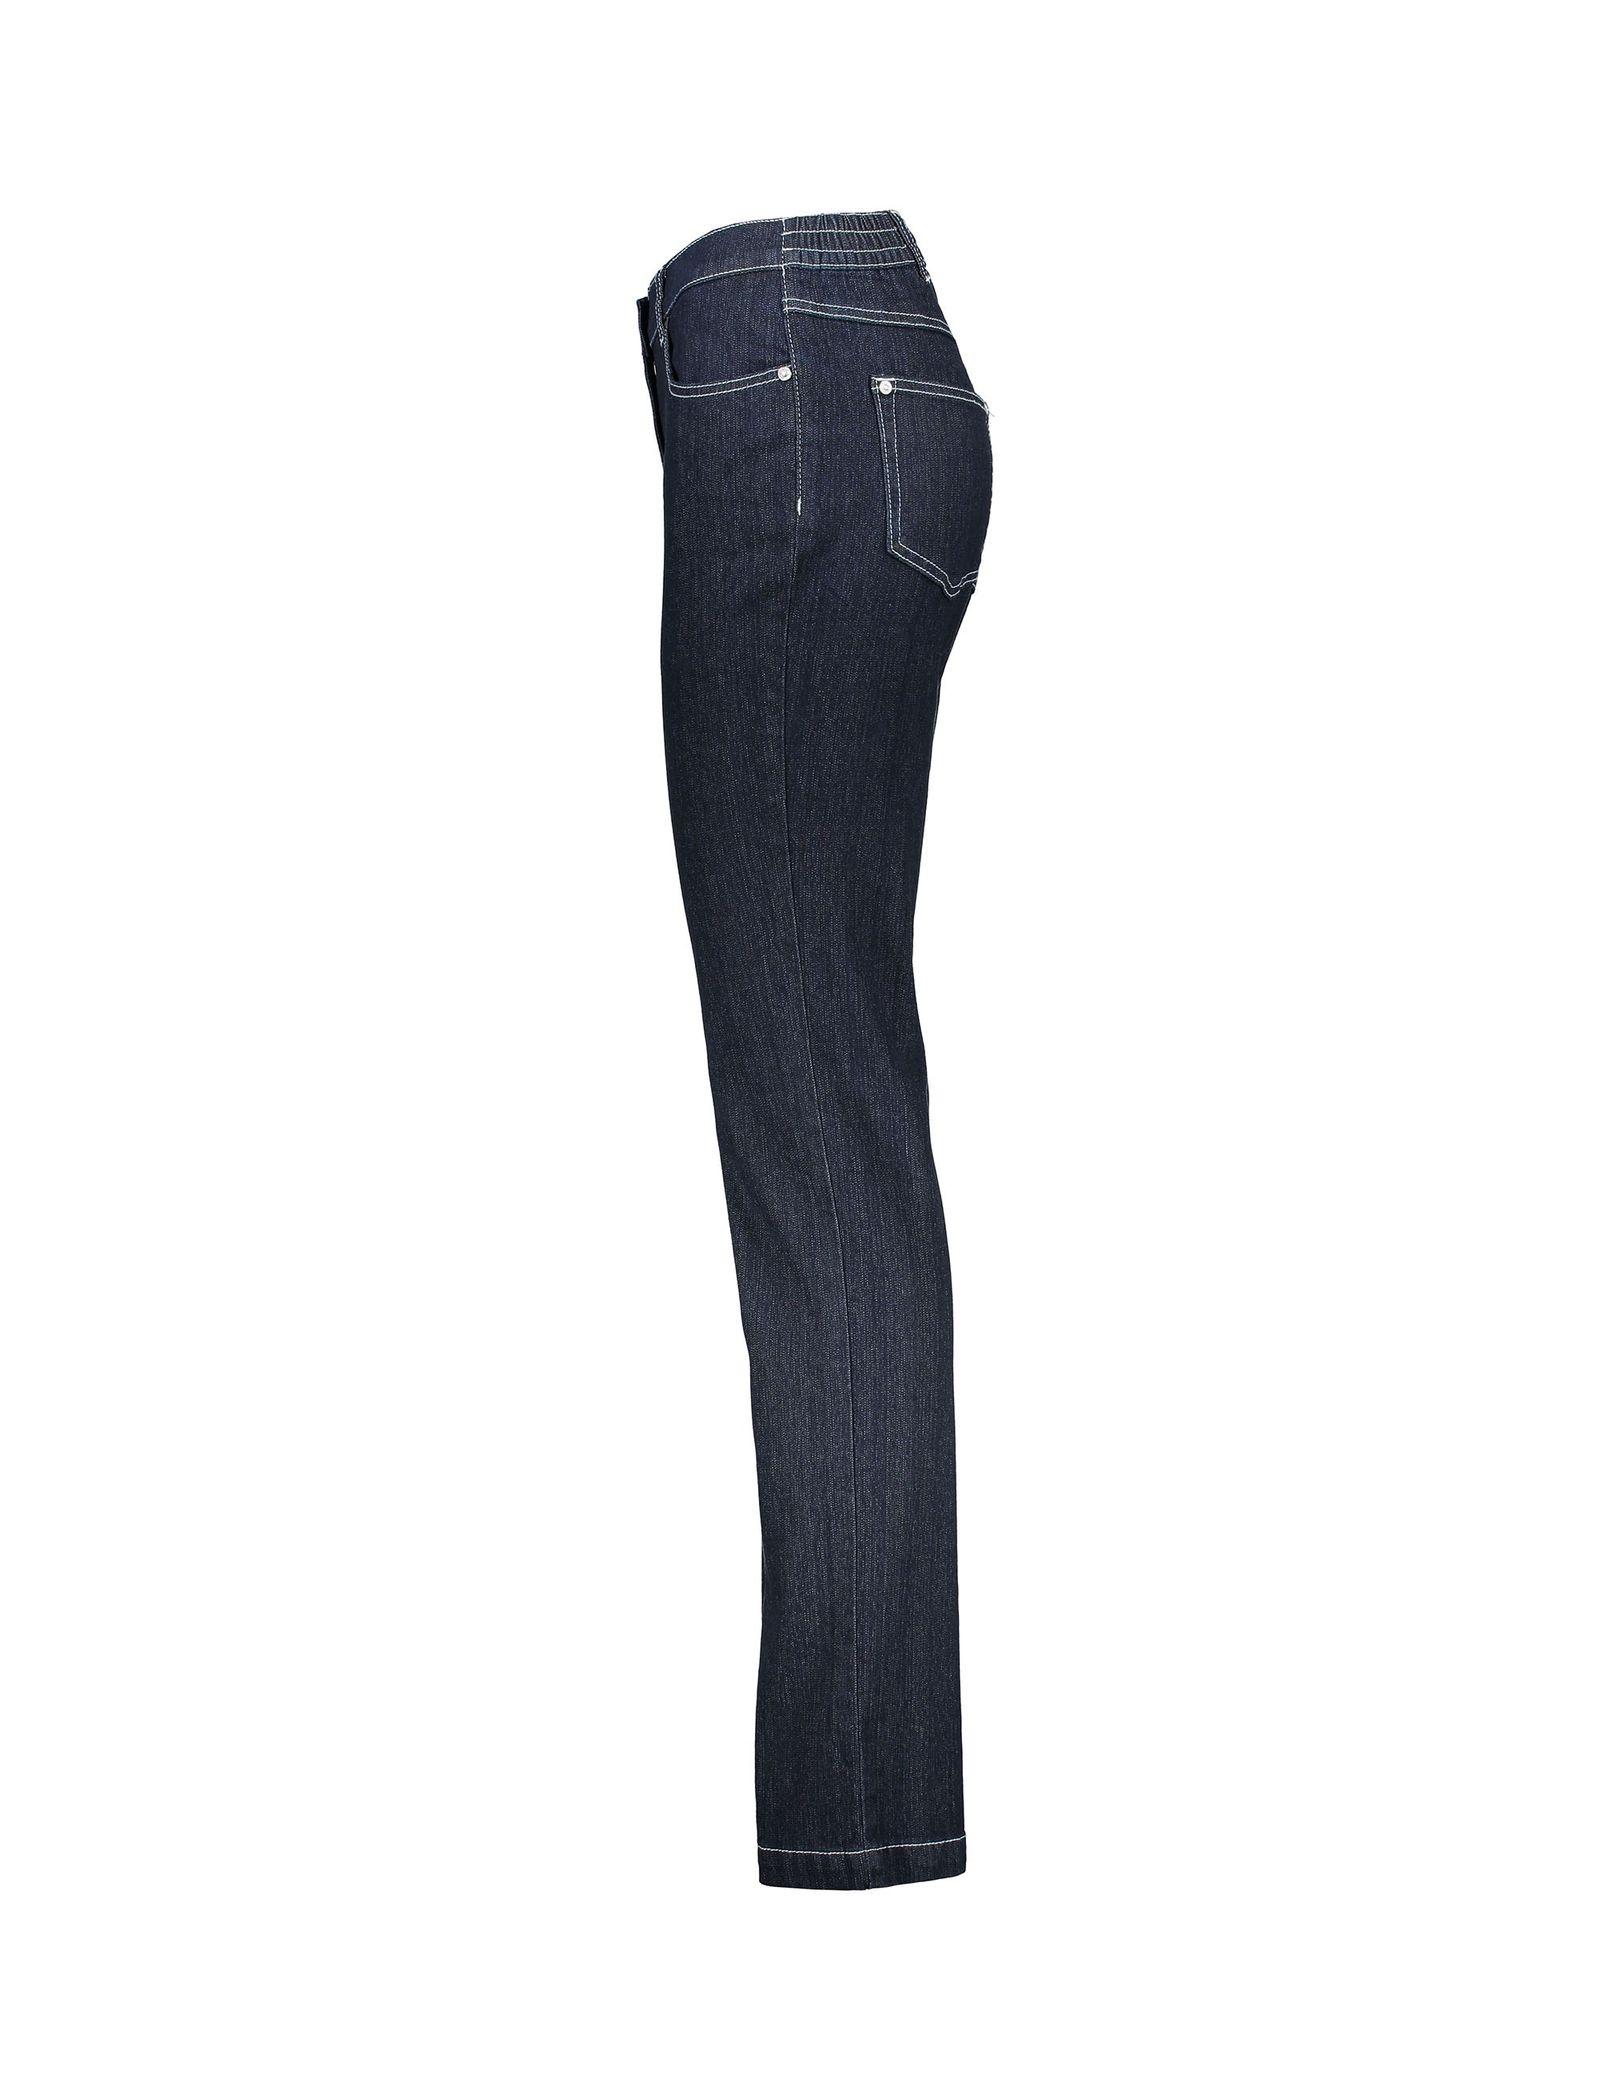 شلوار جین راسته زنانه - پونت روما - جين - 4